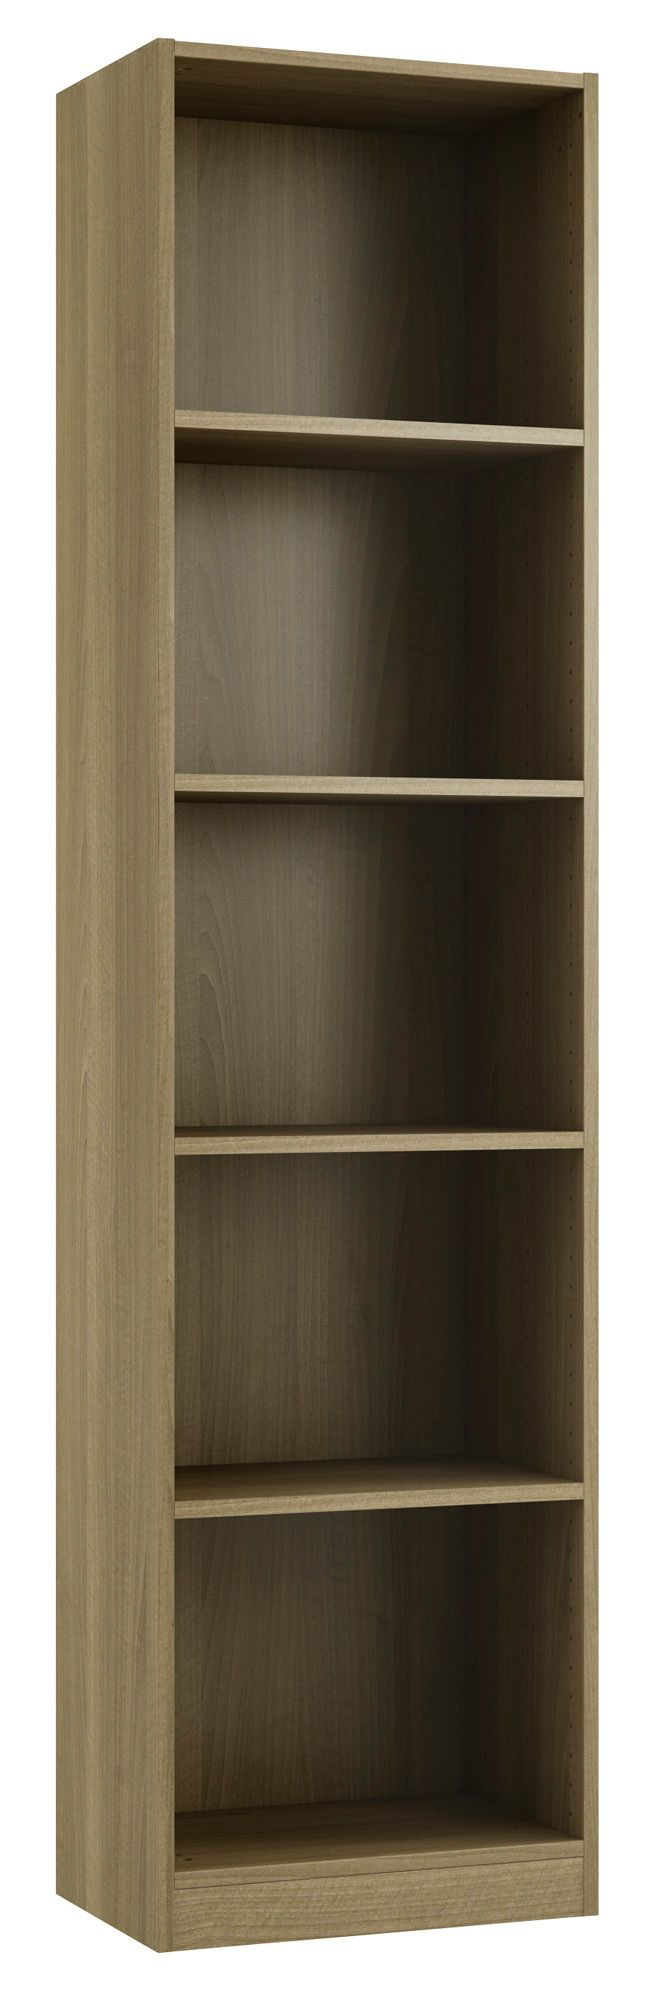 Form Darwin Natural Walnut Effect 4 Shelf Bookcase H  : 0415724301c from www.diy.com size 657 x 2000 jpeg 106kB